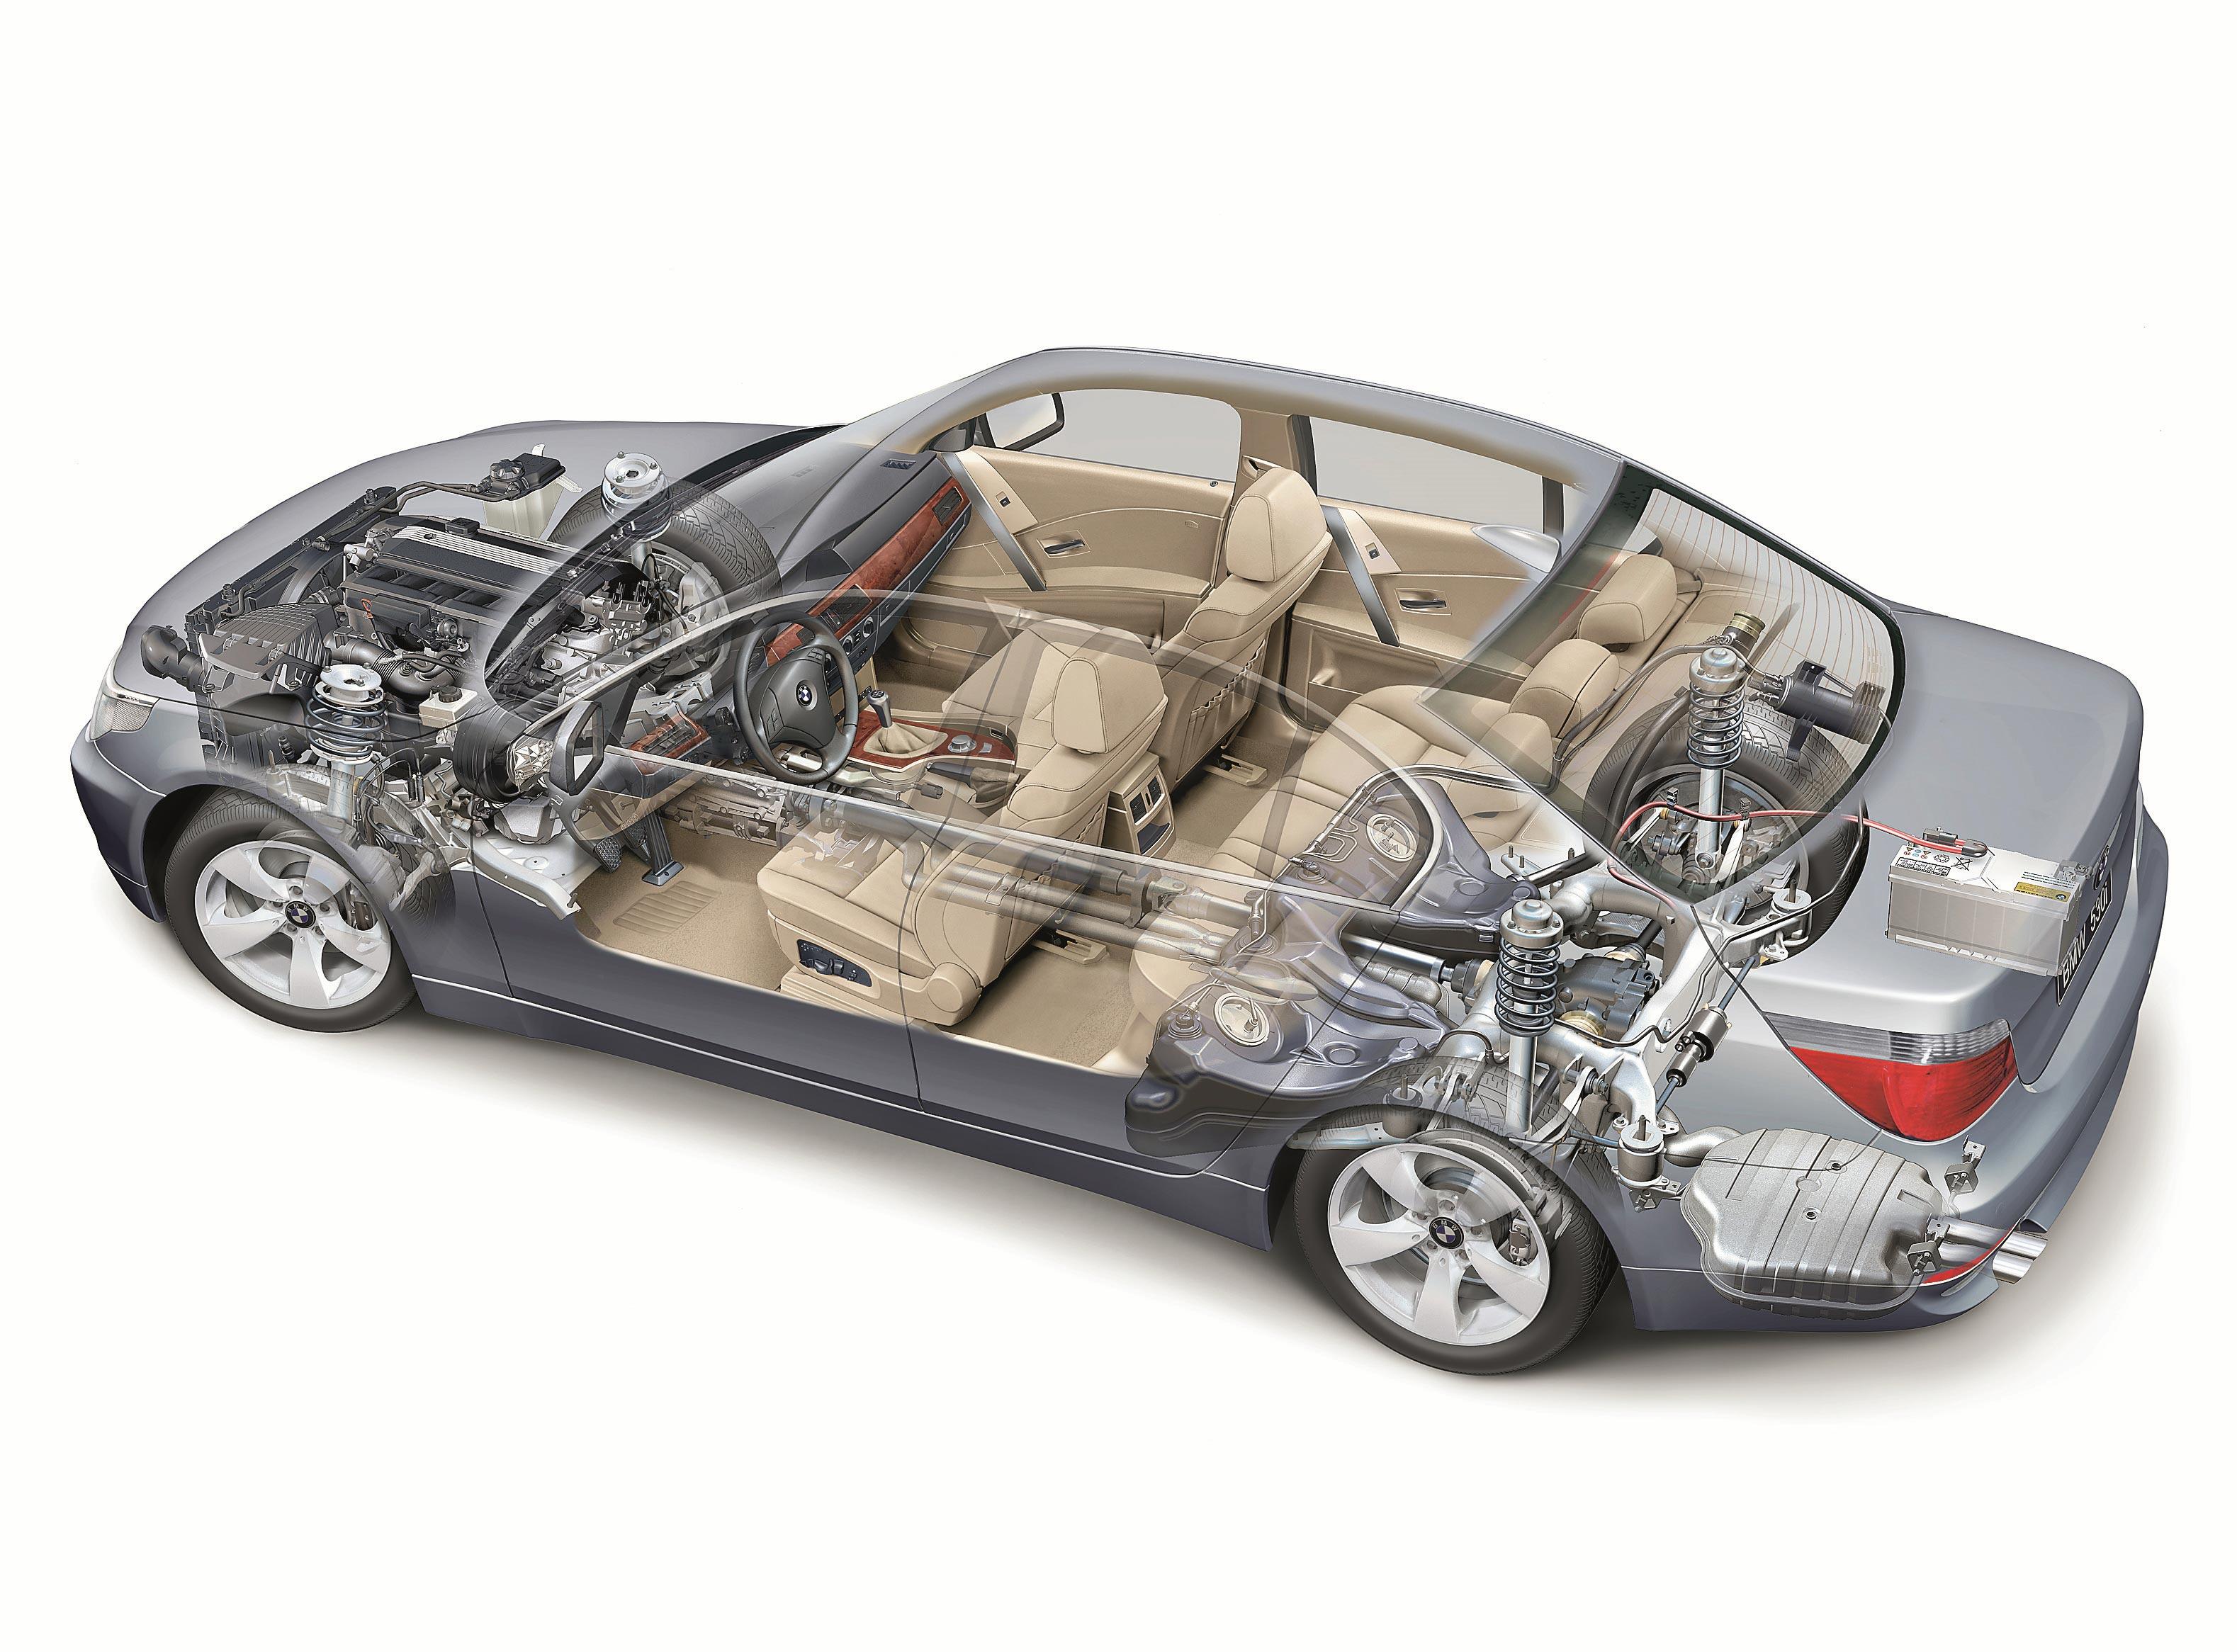 BMW 5 Series E60 cutaway drawing